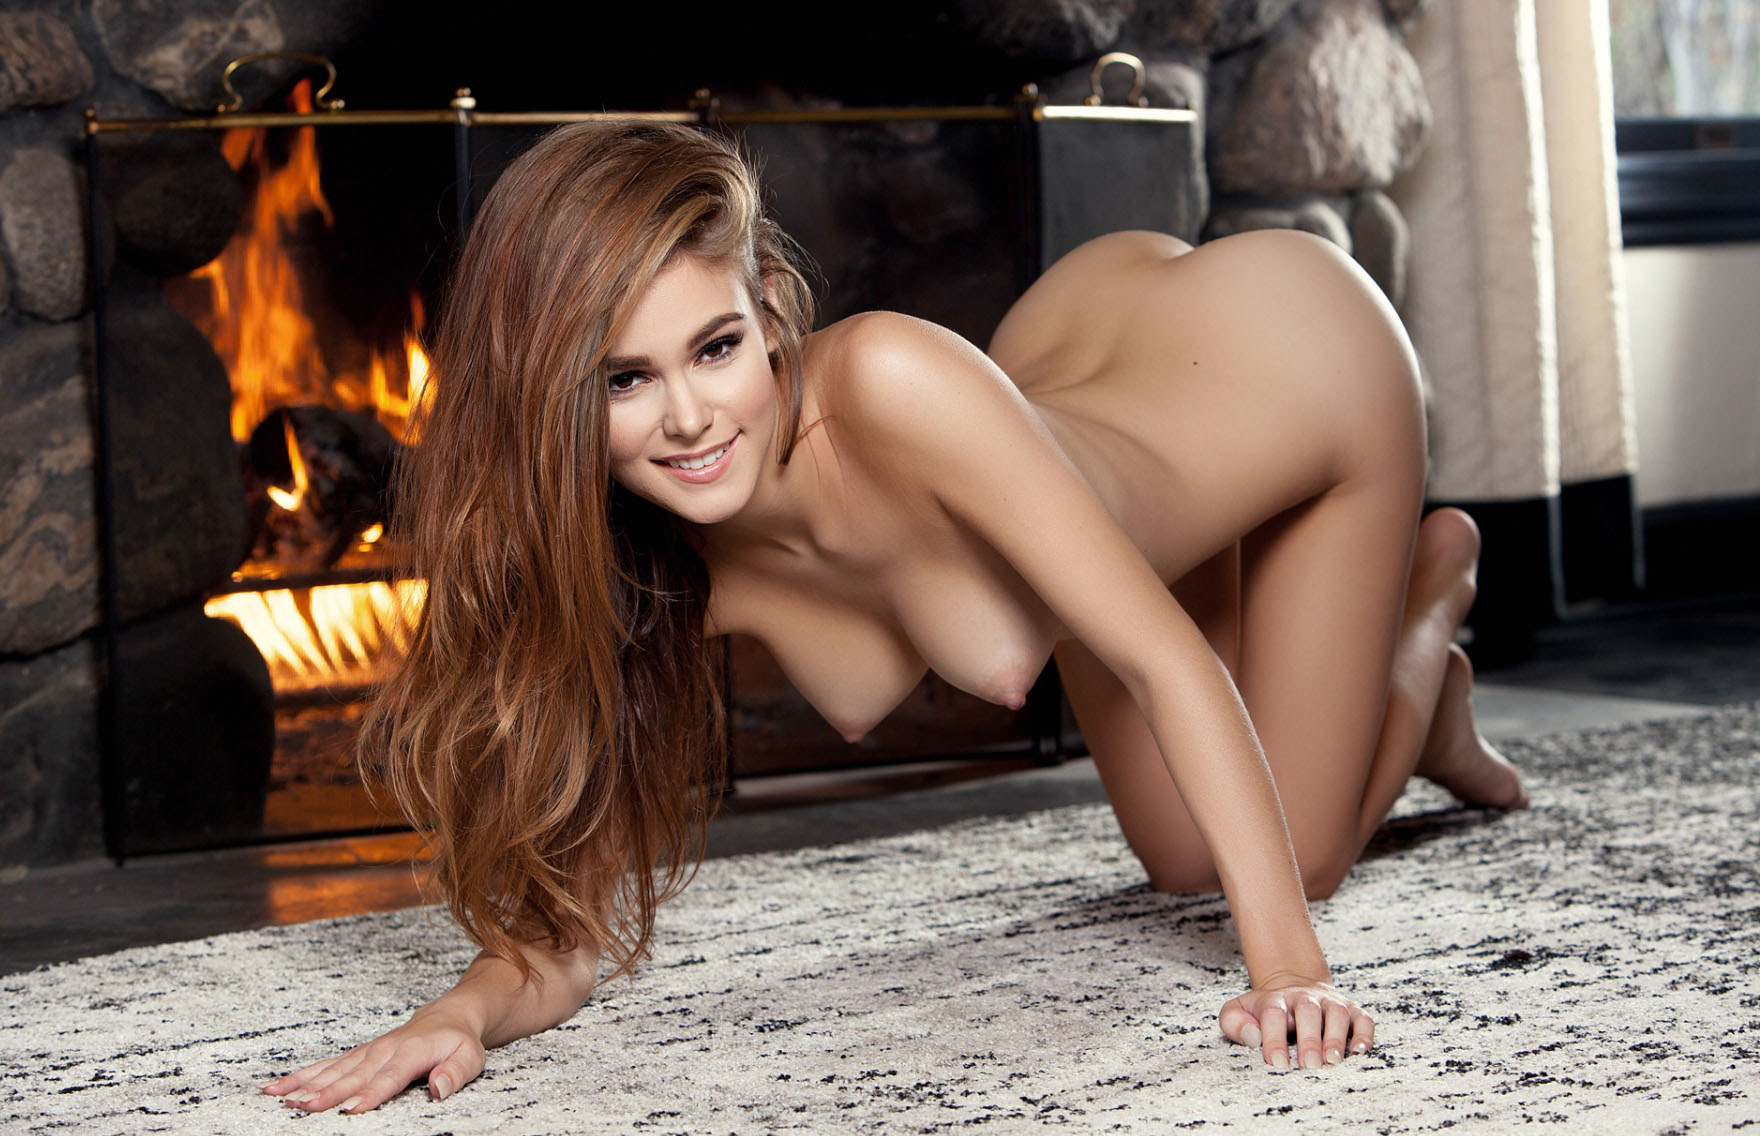 catherine bosley nude pics